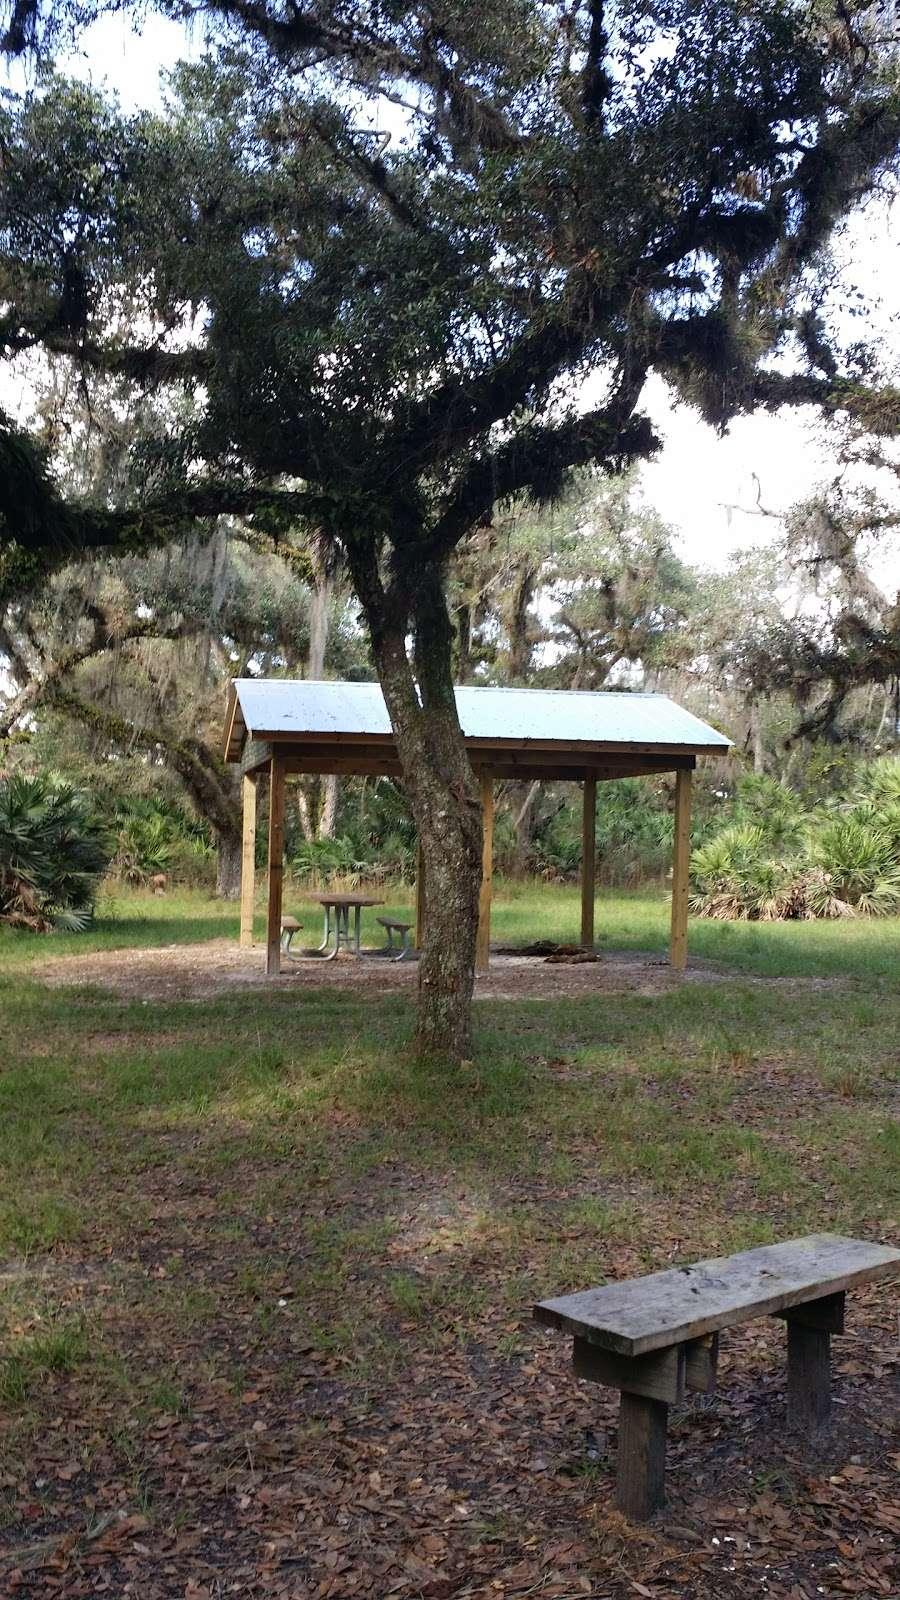 White Loop Group Campsite - campground  | Photo 4 of 5 | Address: Orlando, FL 32833, USA | Phone: (386) 329-4404